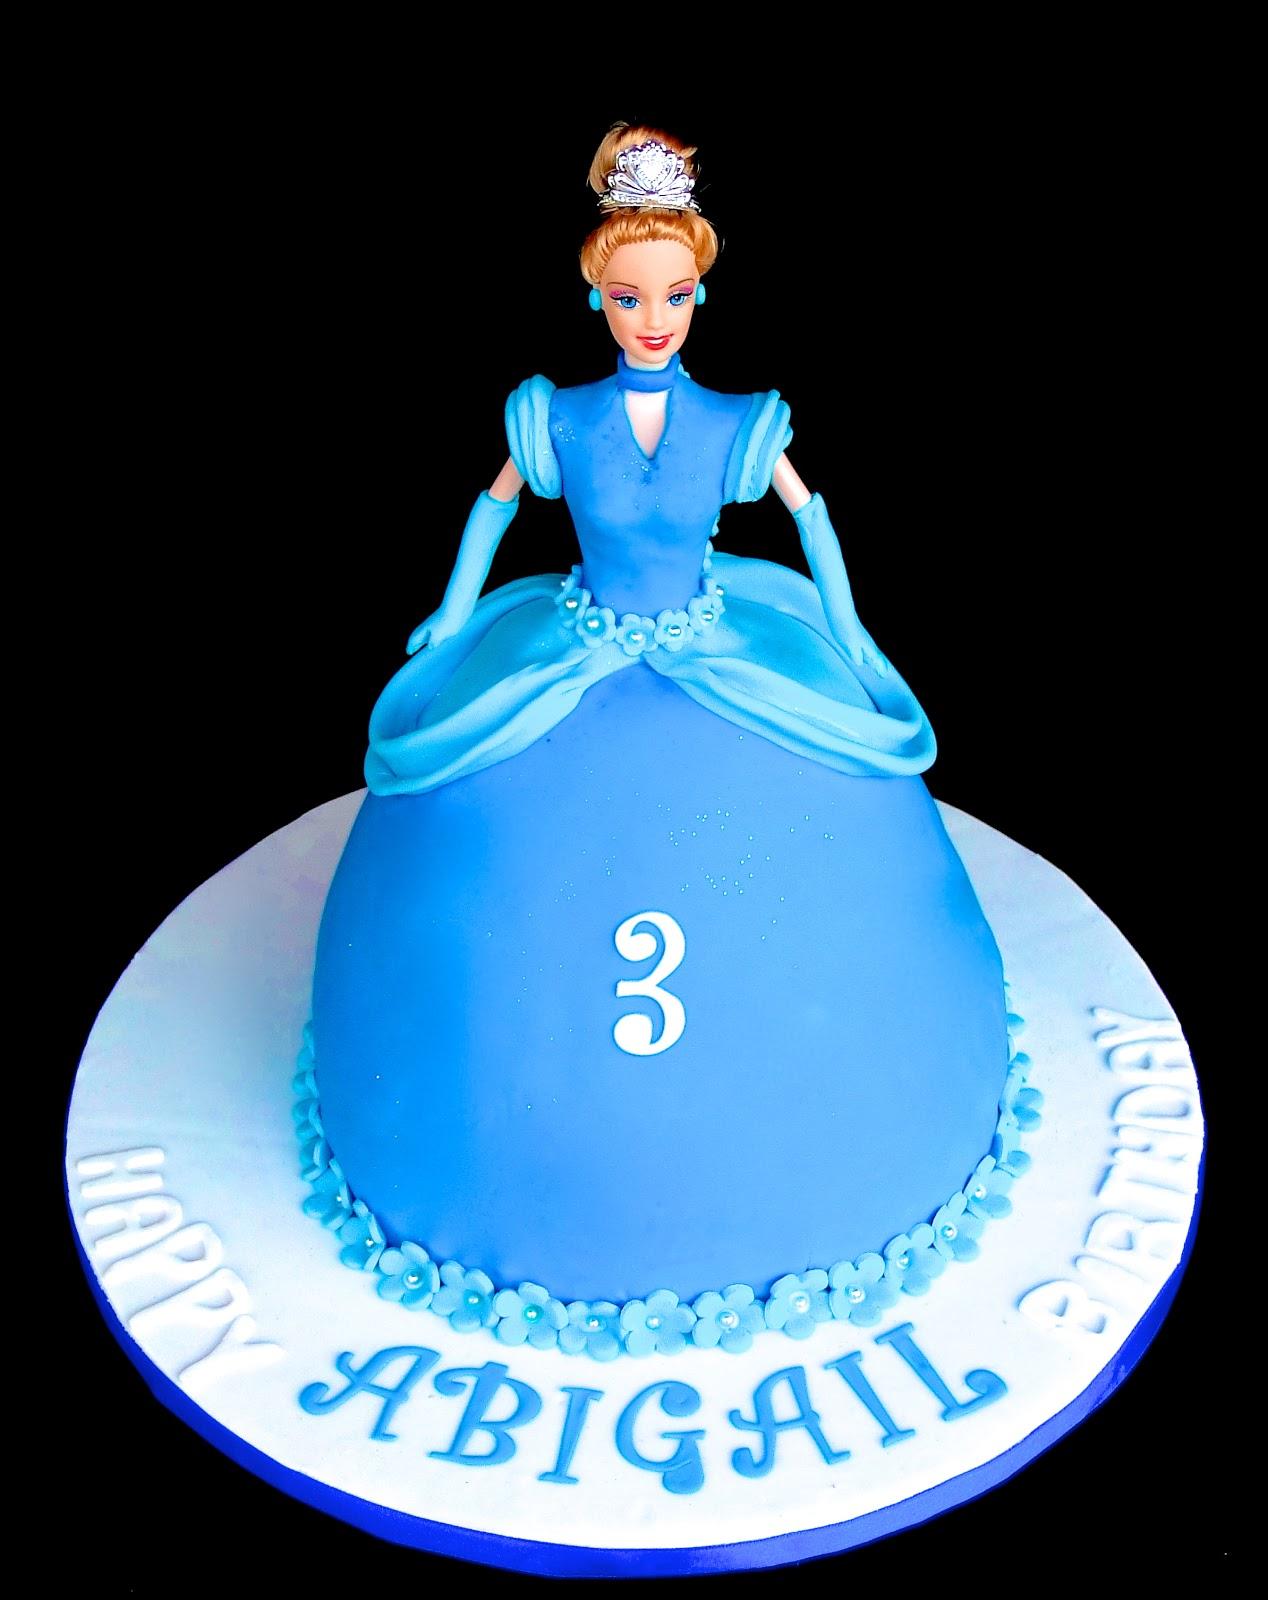 Admirable Cinderella Cakes Decoration Ideas Little Birthday Cakes Birthday Cards Printable Riciscafe Filternl